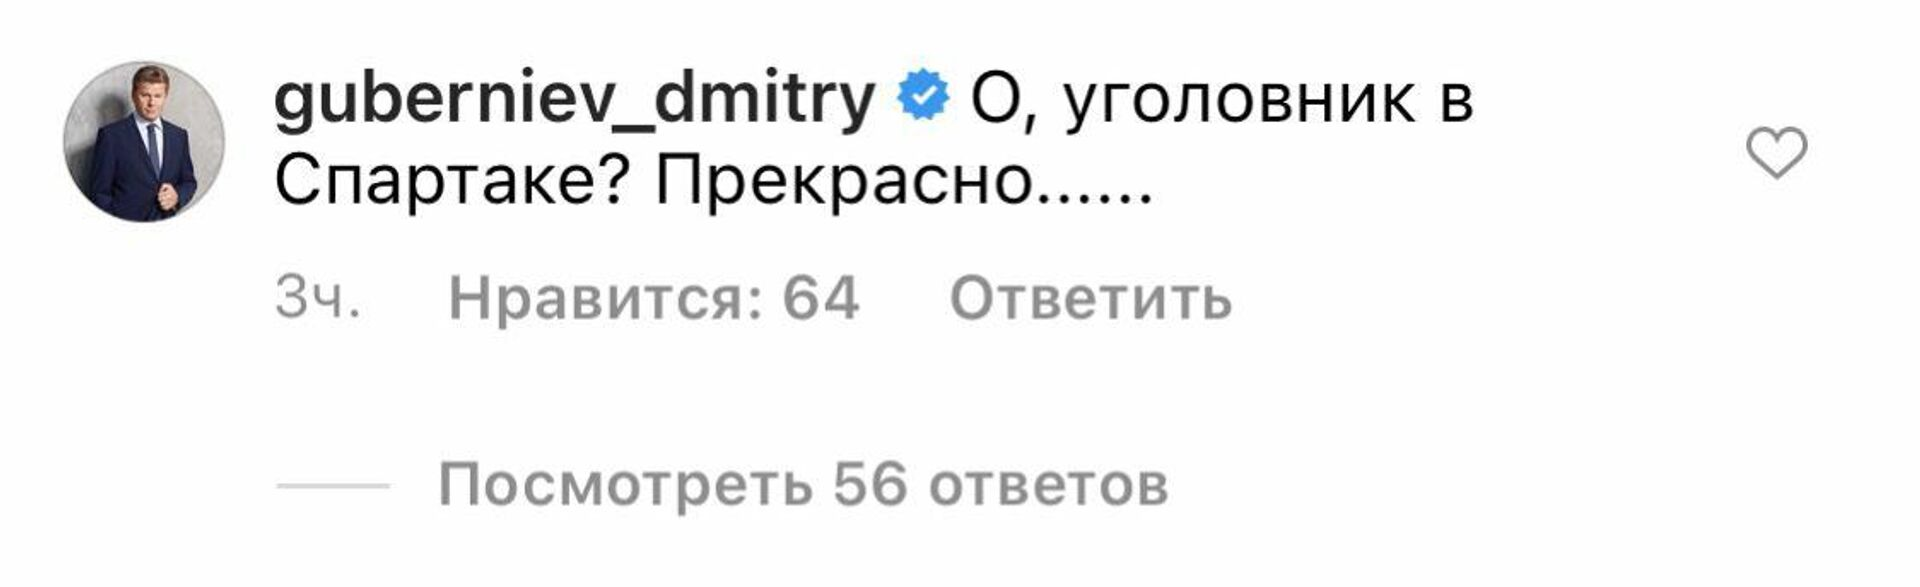 Комментарий в Instagram журналиста Дмитрия Губерниева - РИА Новости, 1920, 18.12.2020